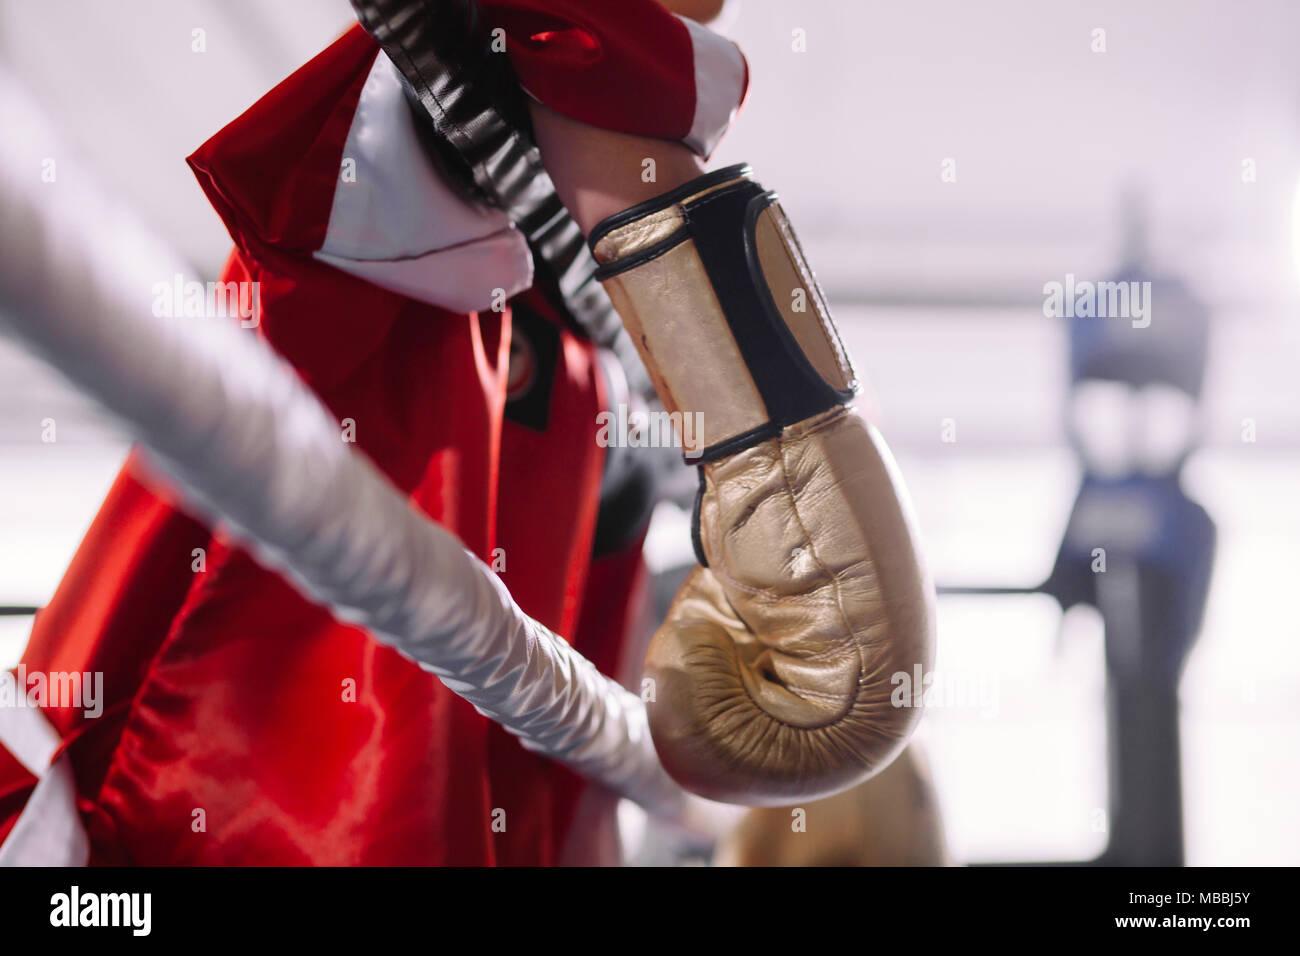 Retrato de sudoroso agotado boxer descansar tras una lucha difícil. Imagen De Stock